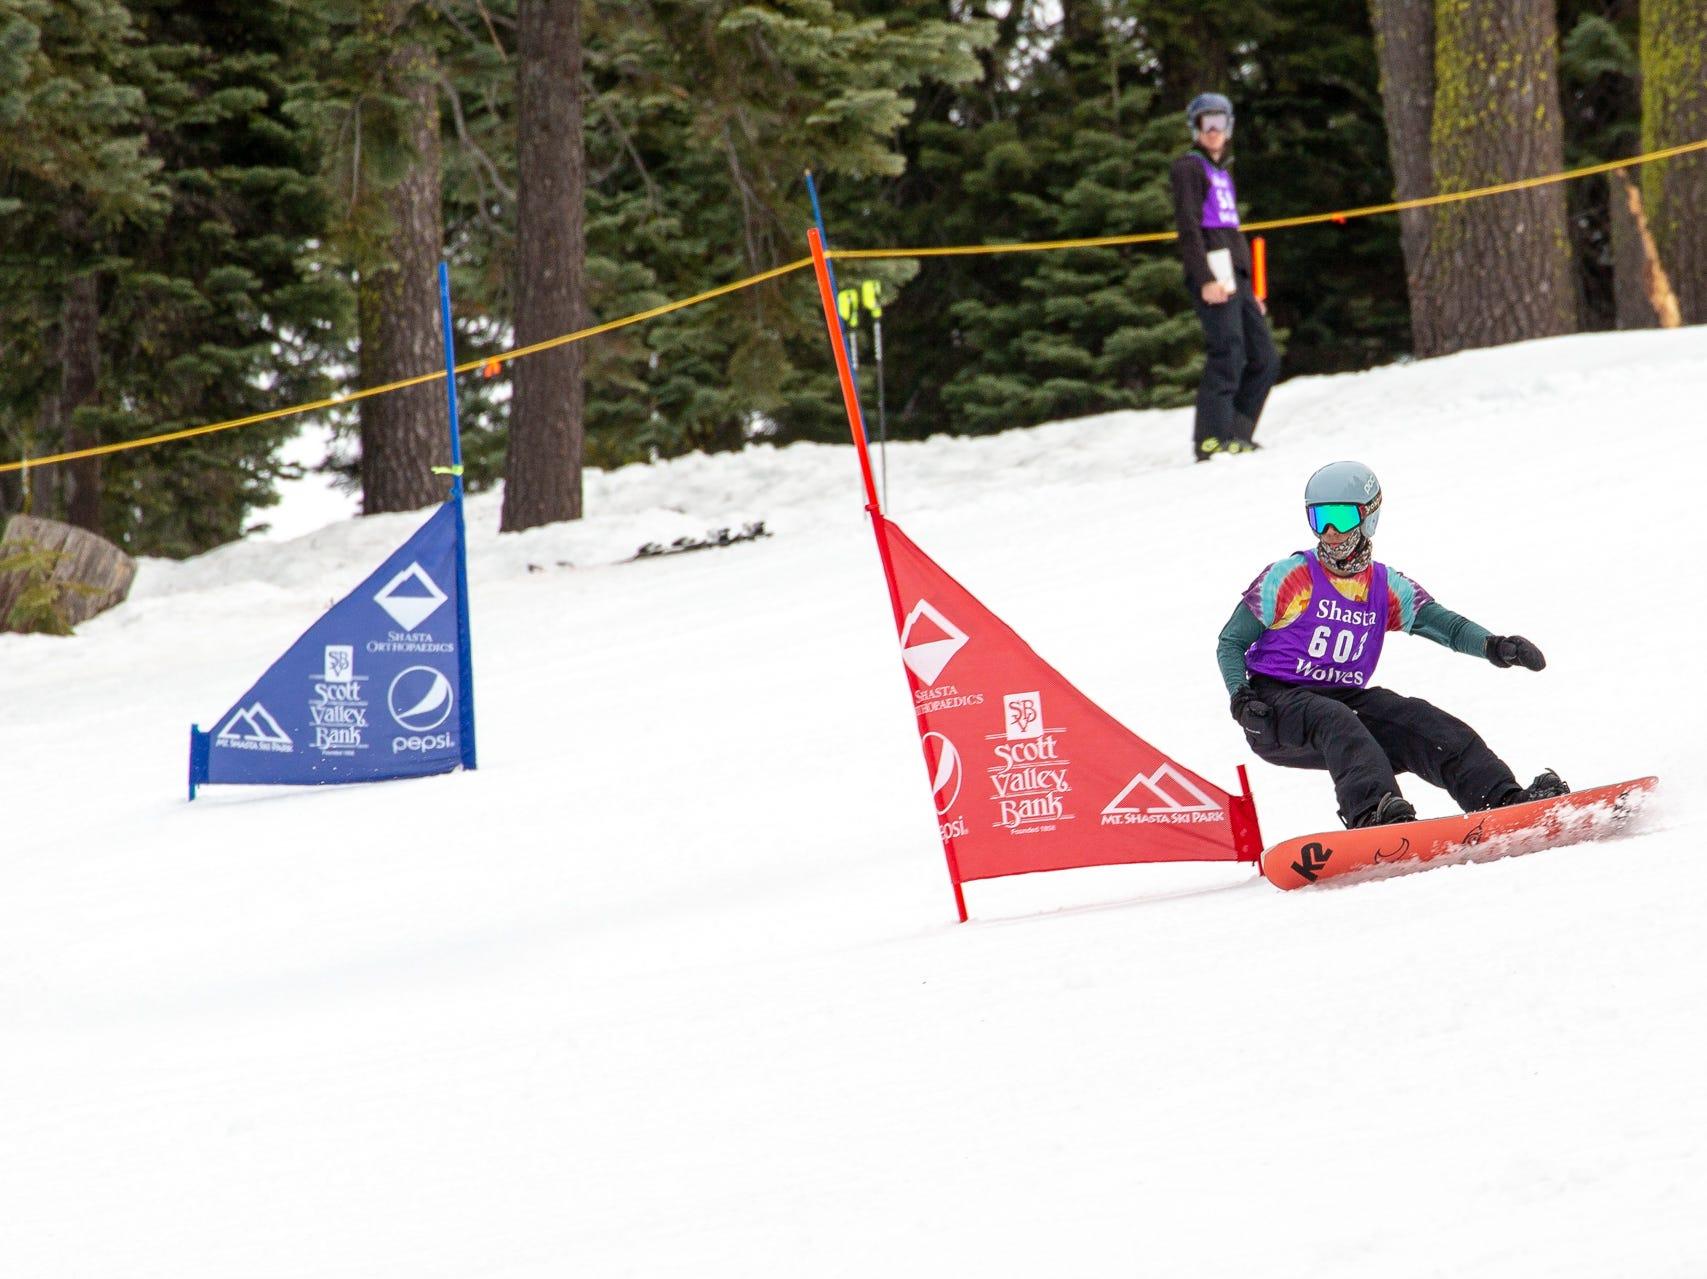 Gabe Rubanowitz of Shasta races in the third high school snowboard meet of 2019 on Monday, Jan. 28 at Mt. Shasta Ski Park.